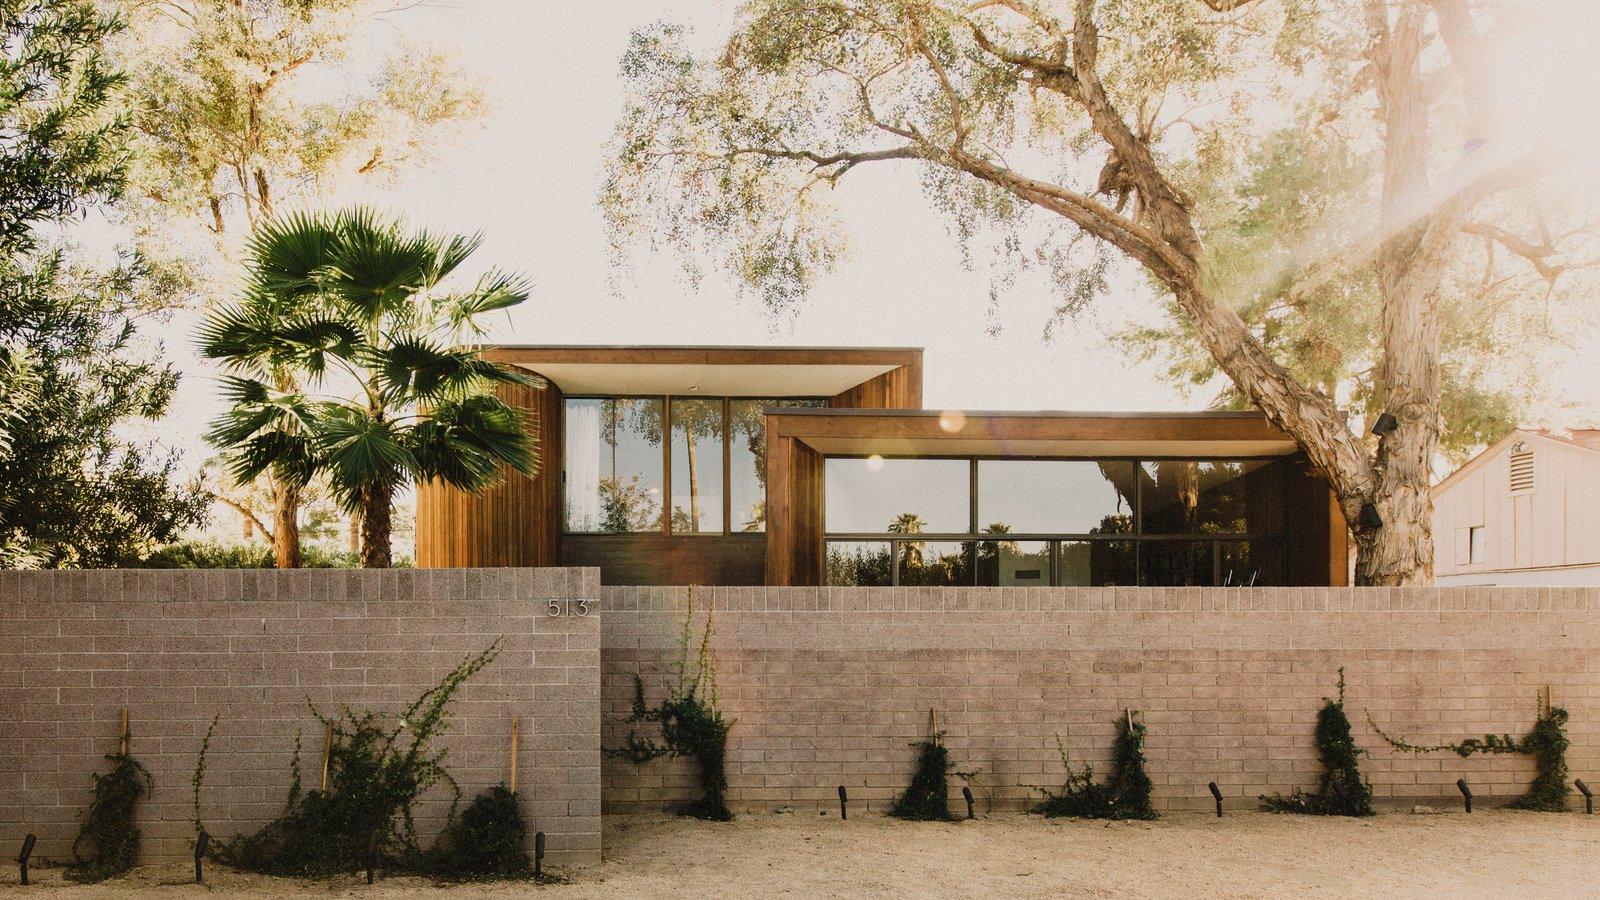 #modern #organic #exterior #wood #concrete #desert  #phoenix #arizona  Curves House by The Ranch Mine